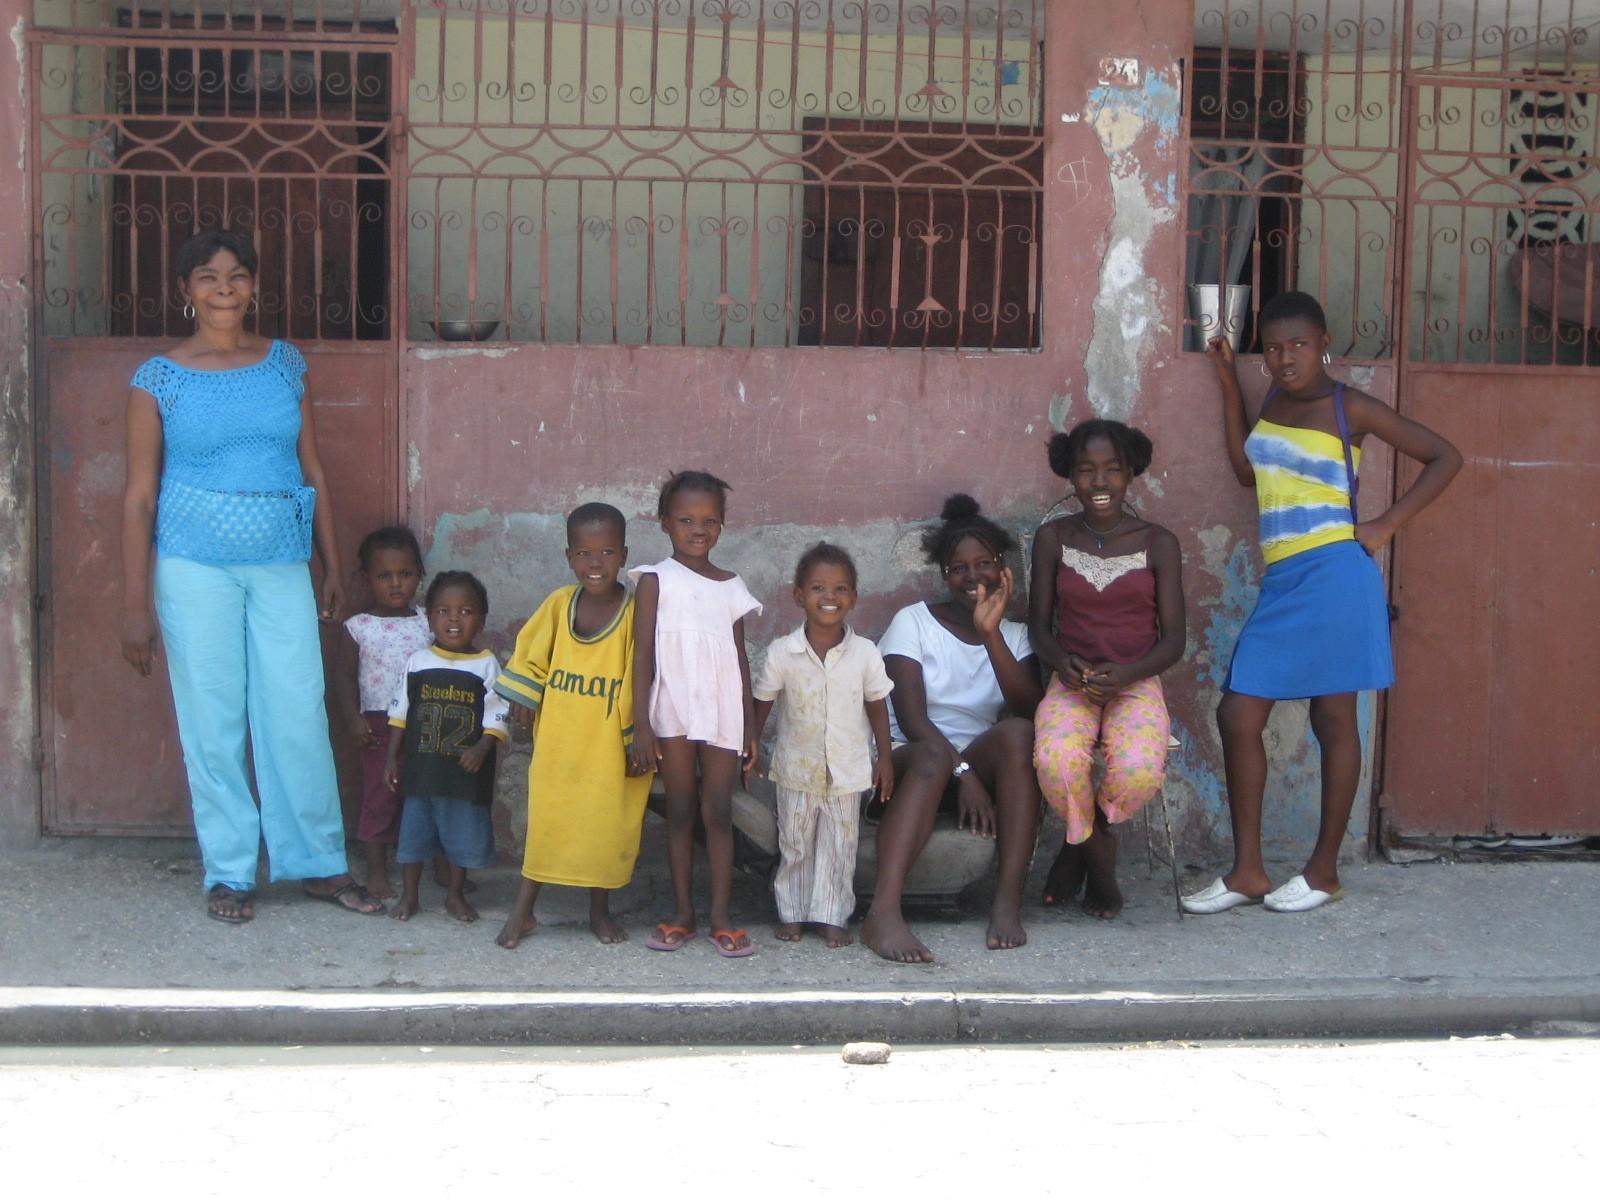 2007, Haiti, TWA, Third World Awareness, charity, non-profit, giving, helping, community, Cité Soleil, Haitians